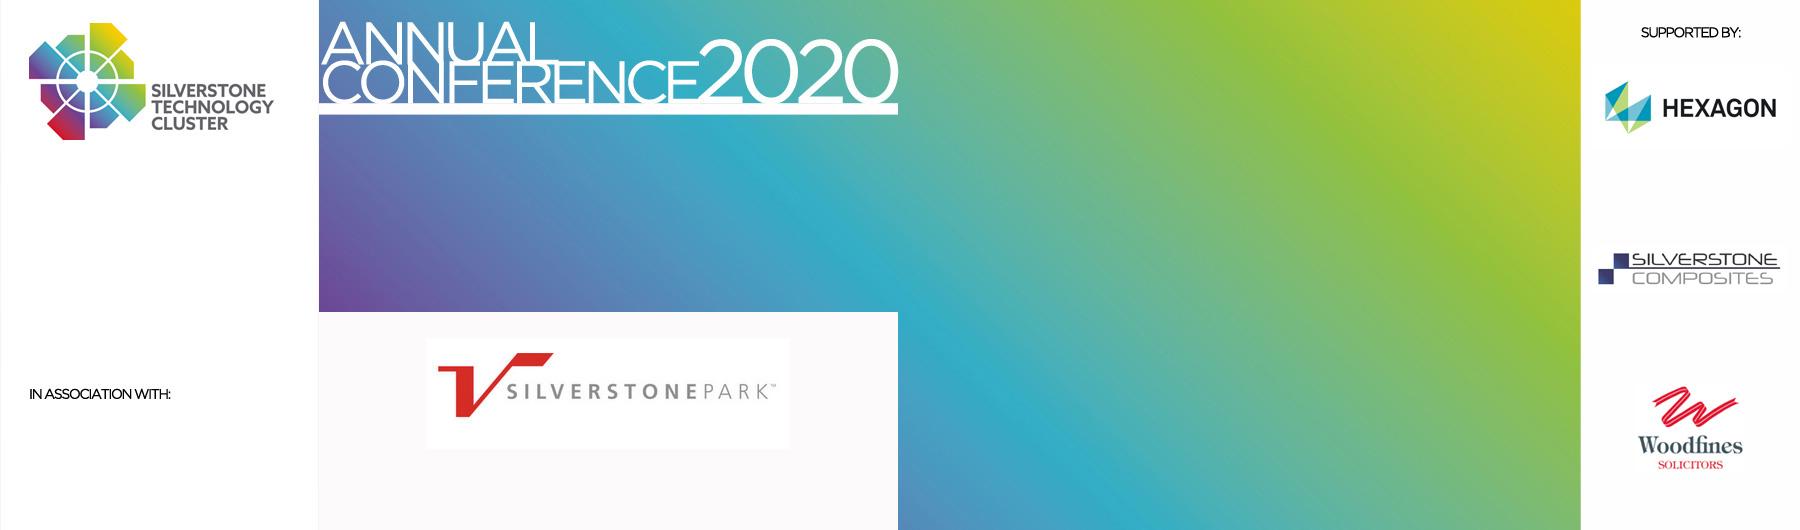 2020 Annual Showcase Conference